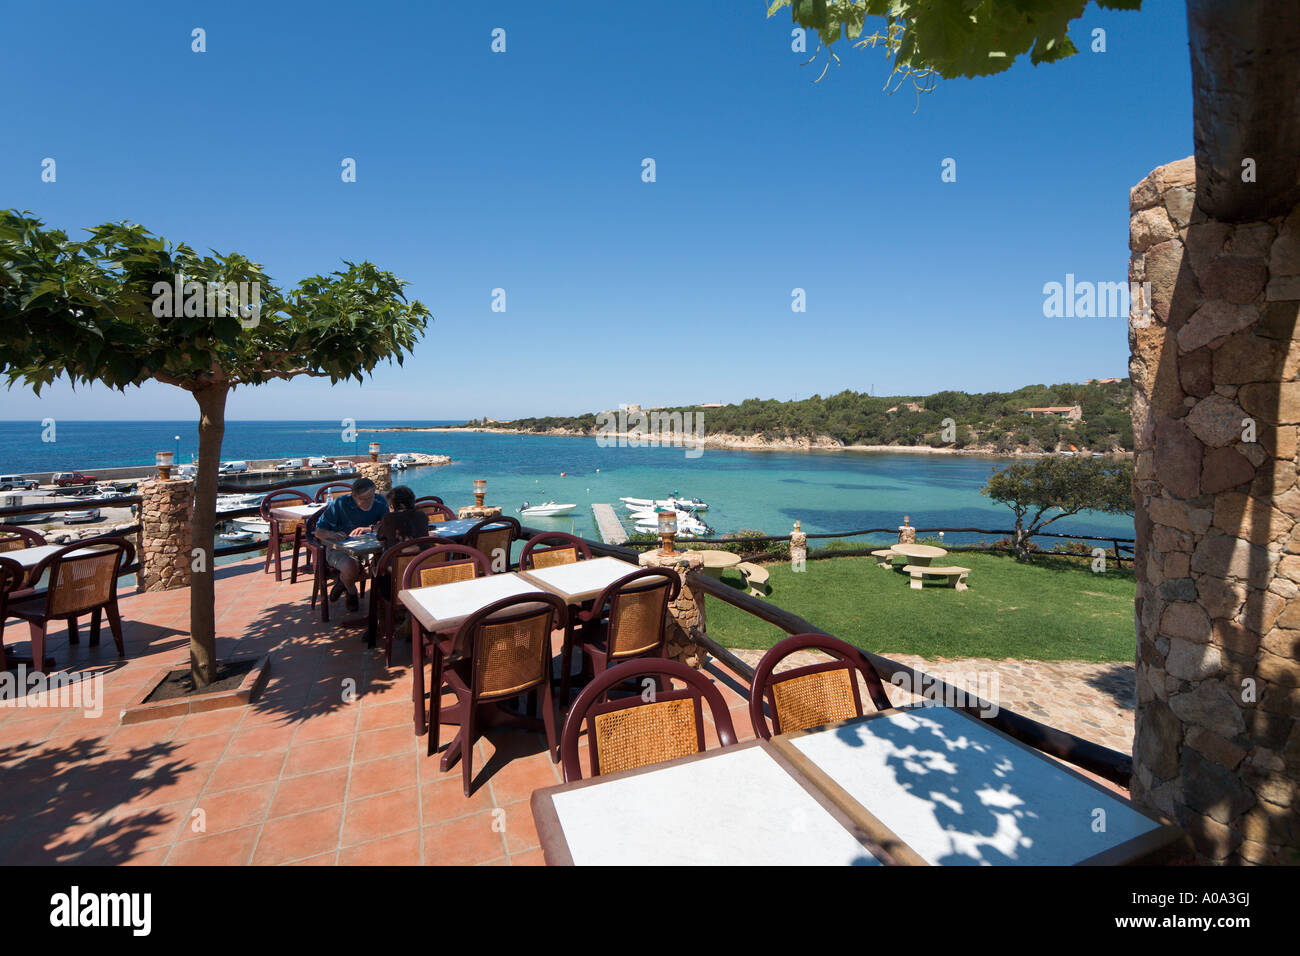 Terrace of a seafront restaurant in the resort centre, Tizzano, near Sartene, Corsica, France Stock Photo